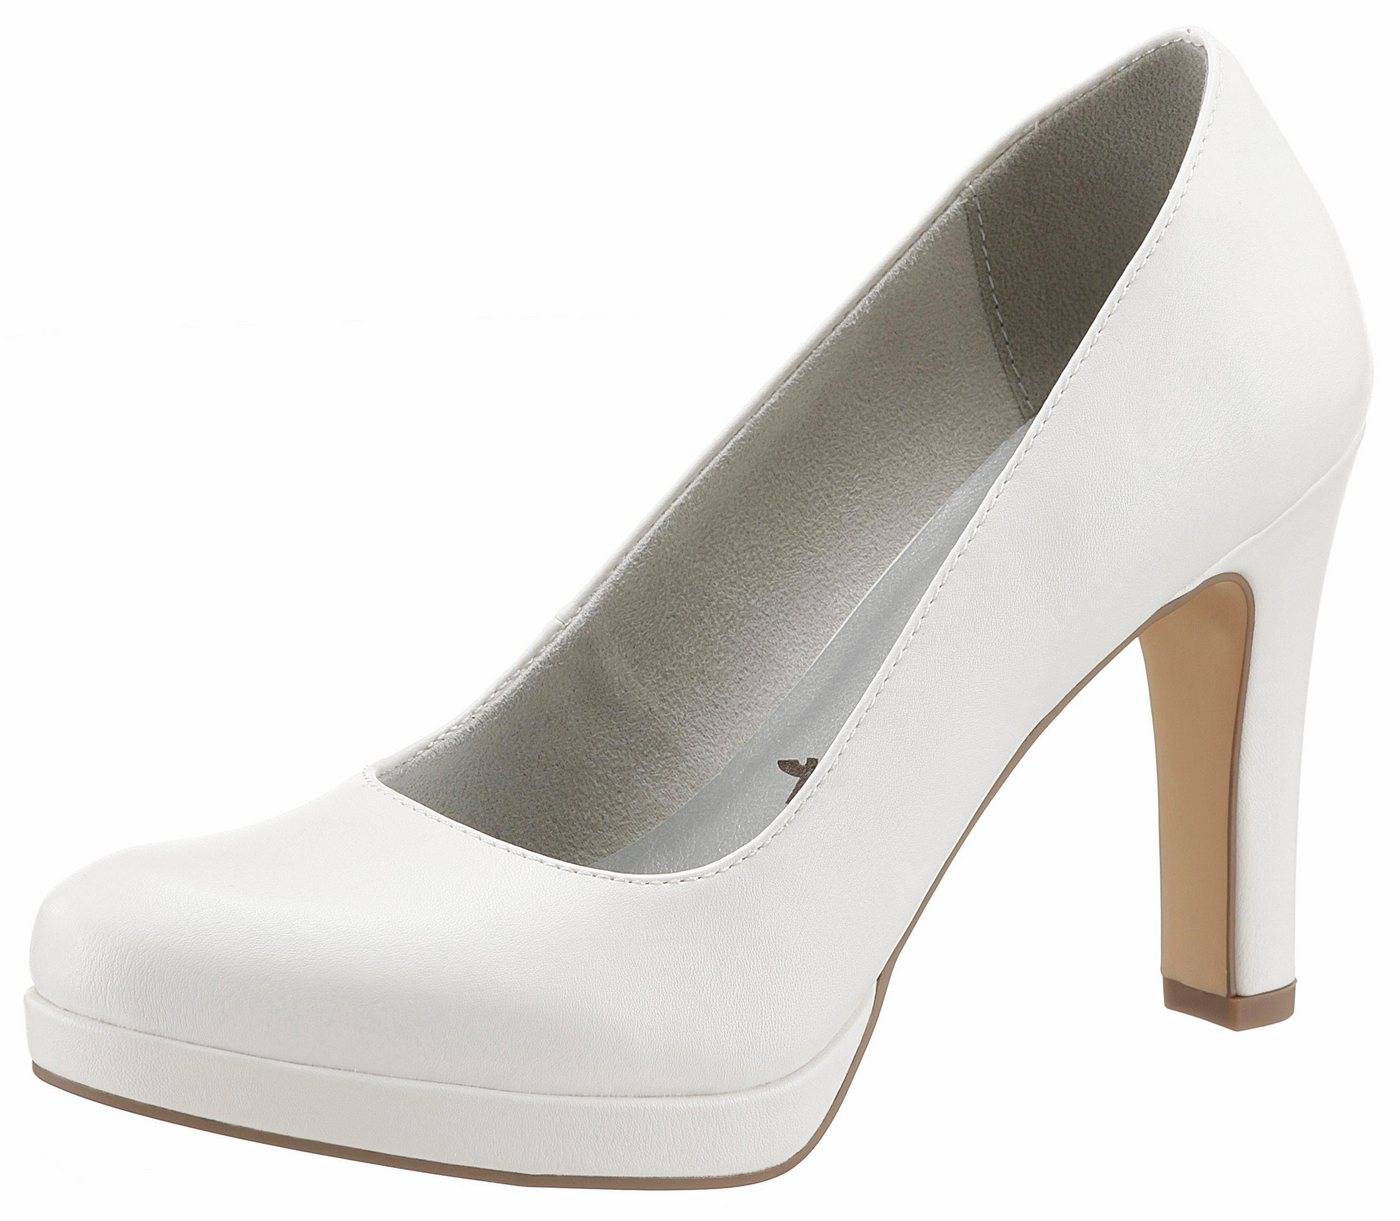 Tamaris High-Heel-Pumps in schlichtem Look | Schuhe > High Heels | Weiß | Tamaris